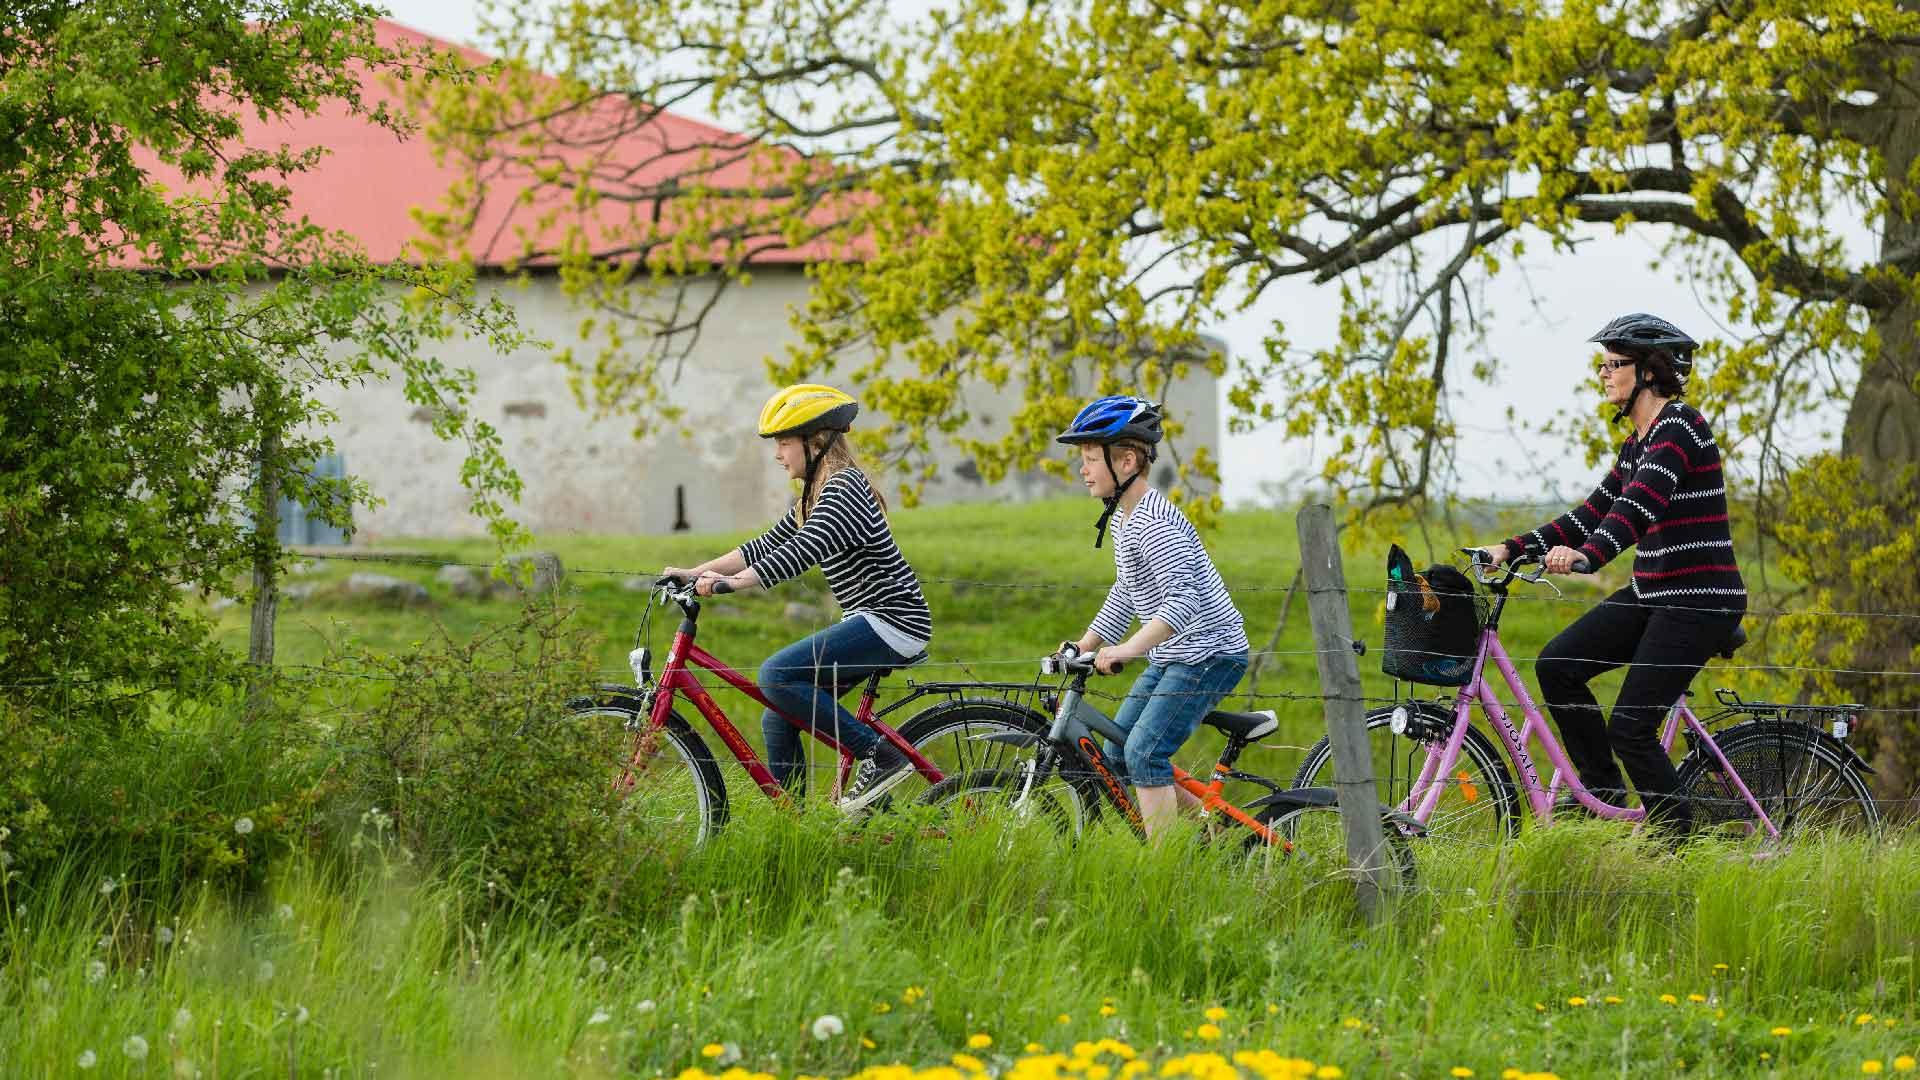 Cykla i Vattenriket, Lillö. Foto: Sven Persson, Svelo